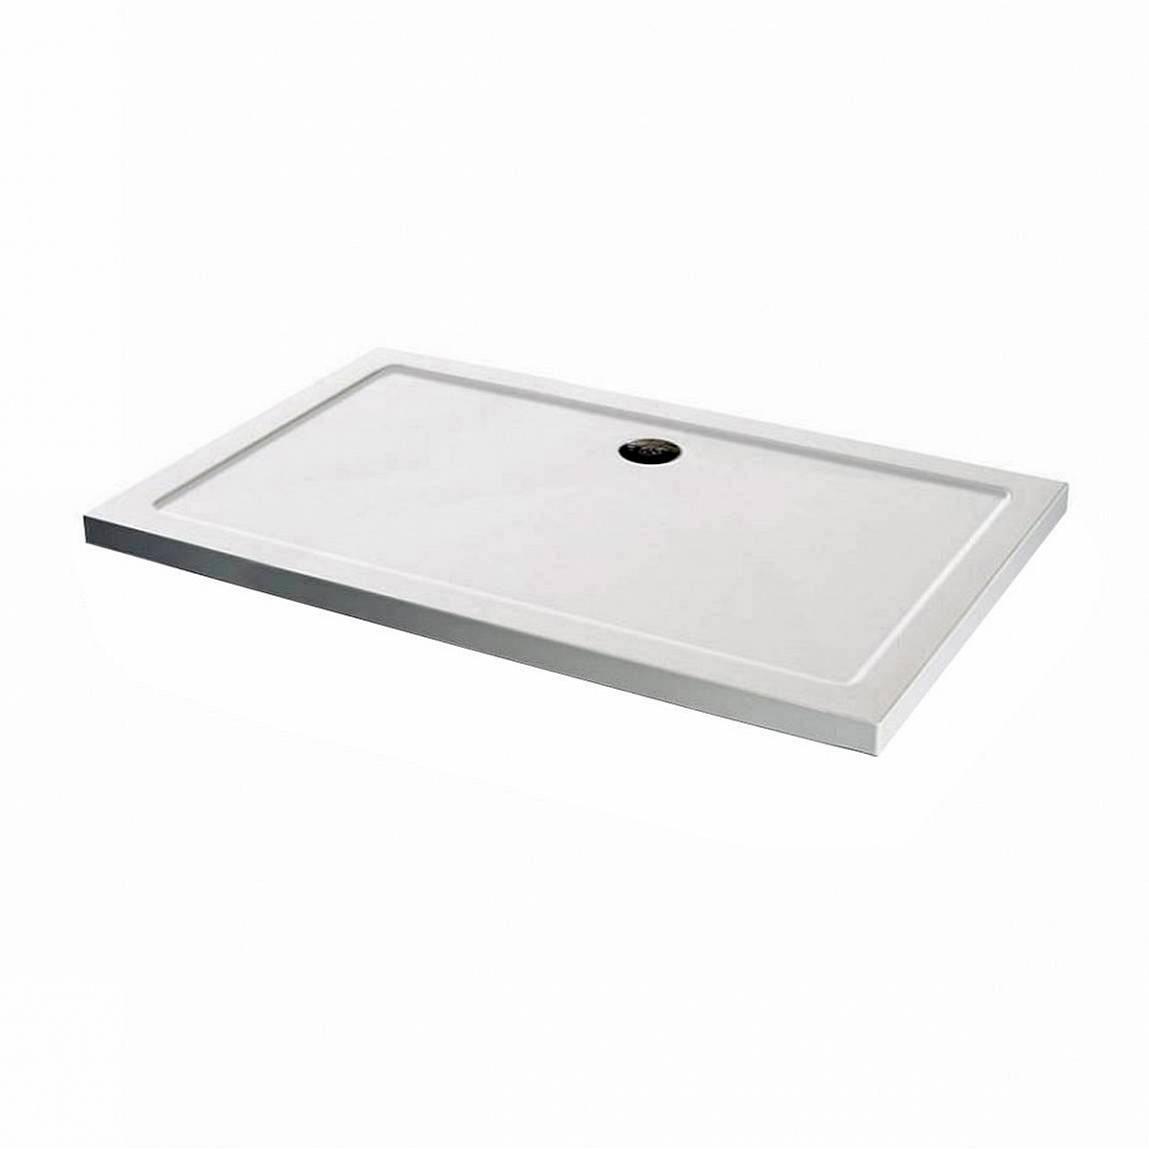 Image of Rectangular Stone Shower Tray 1200 x 900